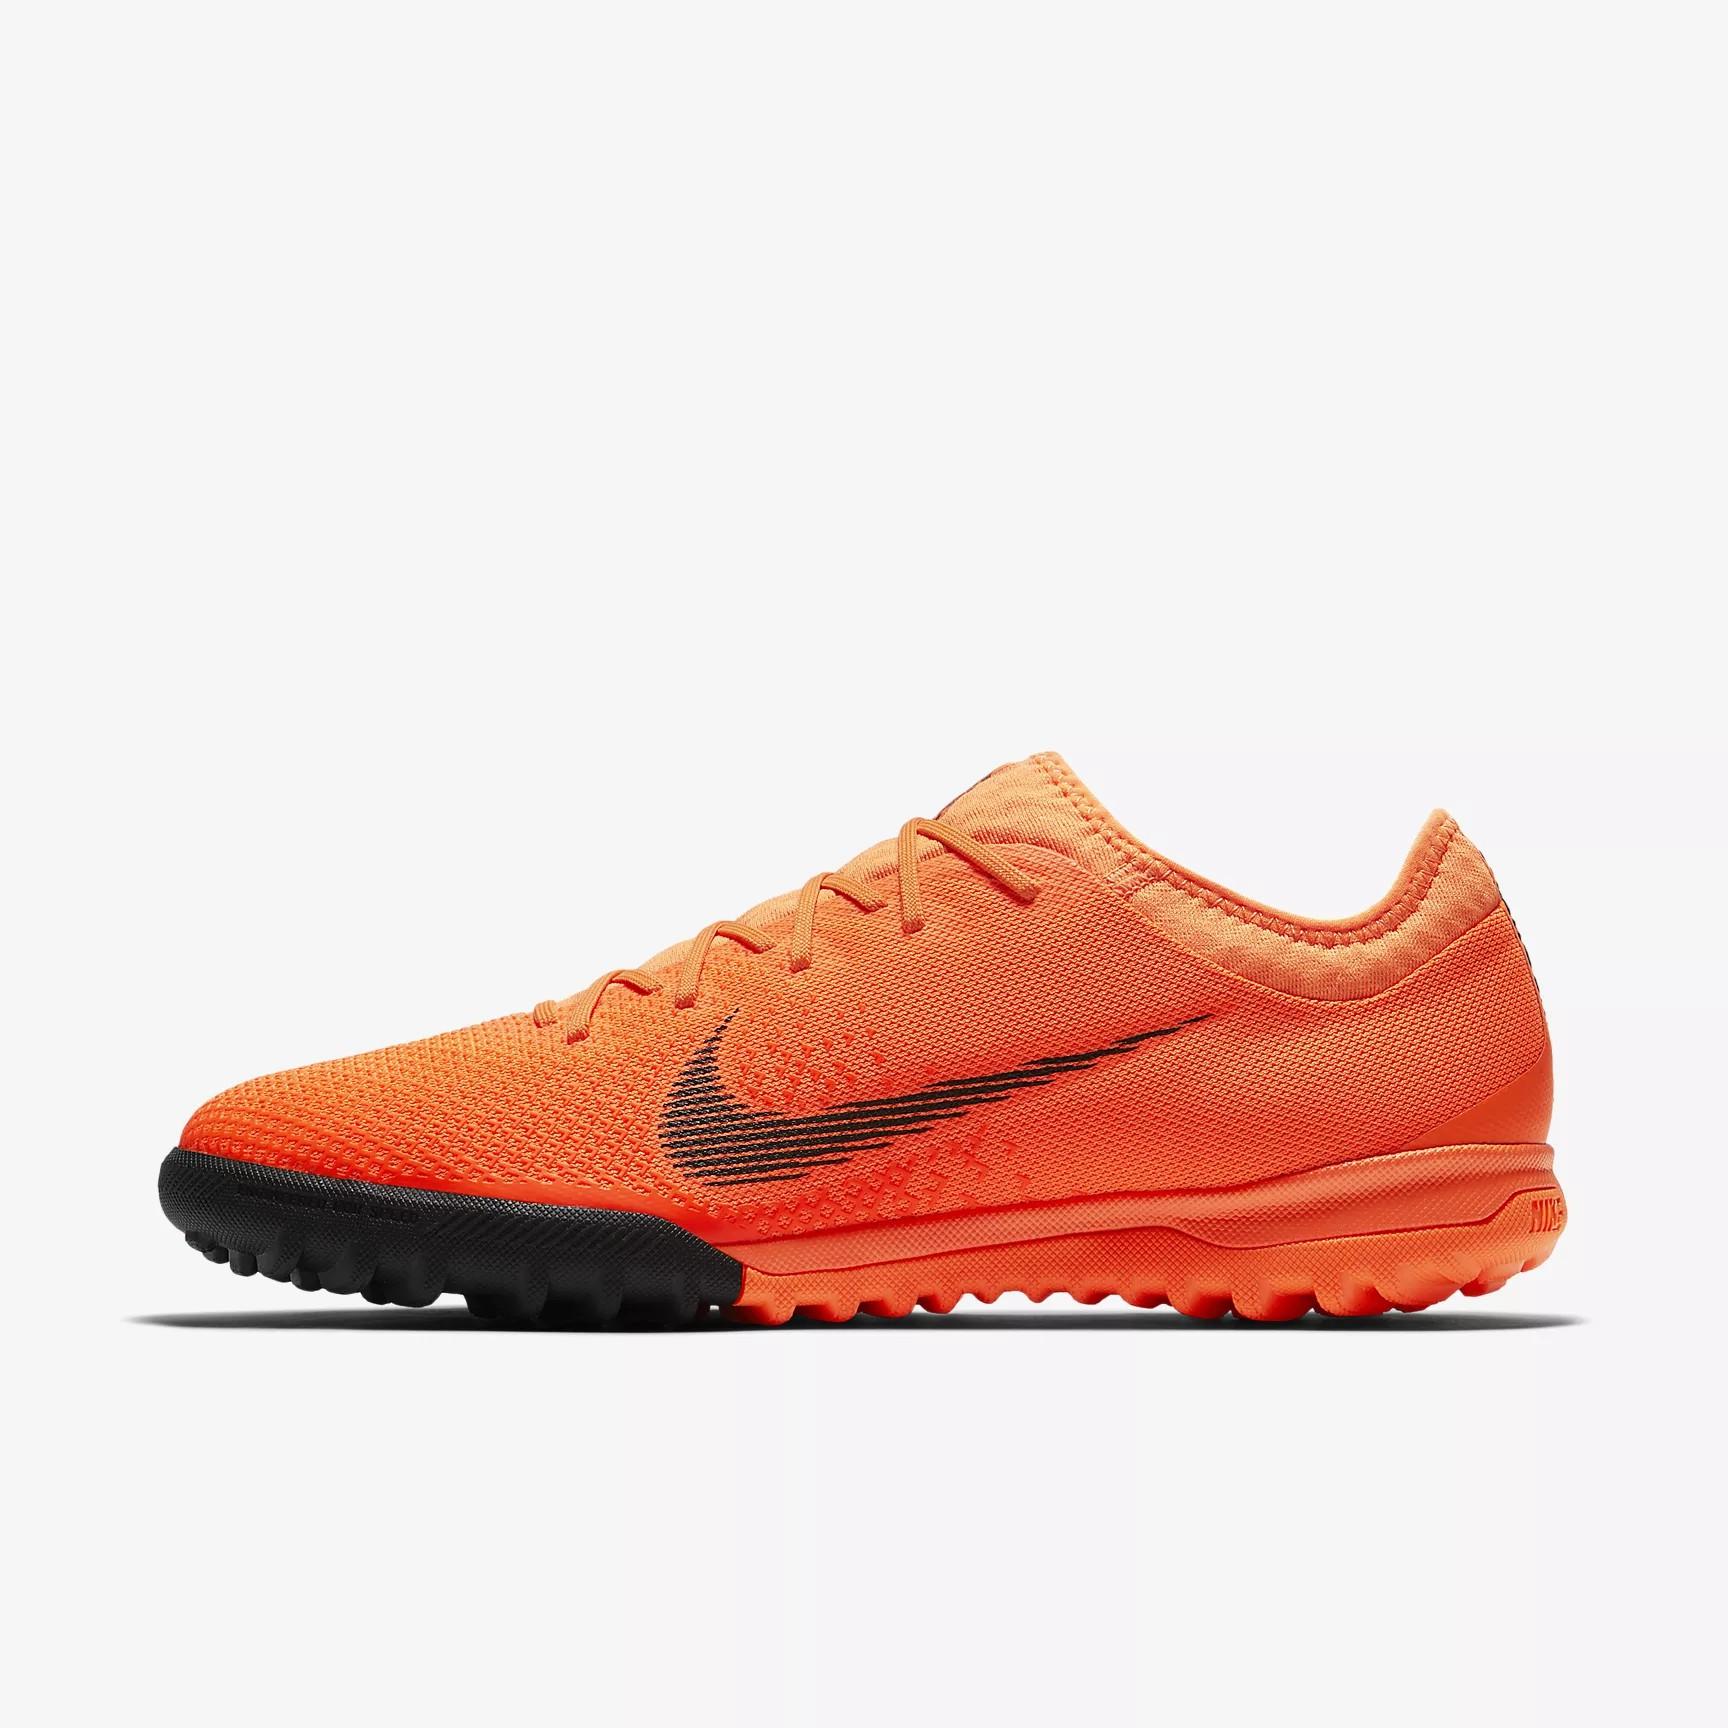 8239dbcc399 Click to enlarge image  nike mercurialx vapor xii pro tf total orange total orange volt white a.jpg  ...